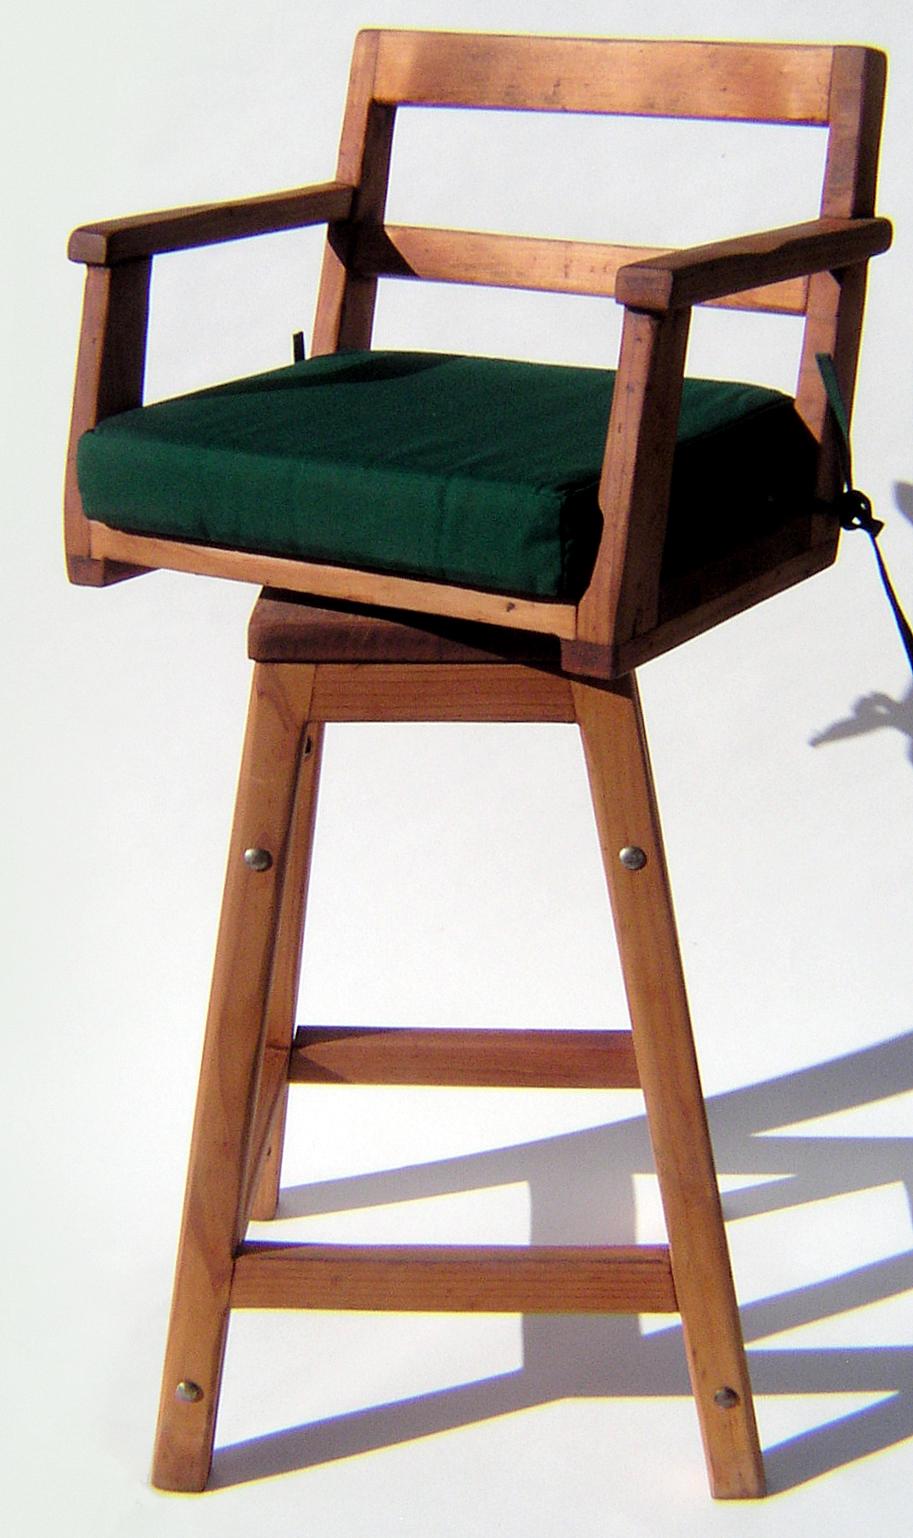 wood stool chair design huge bean bag chairs redwood captain s bar wooden stools options mature swivel seat 31 h